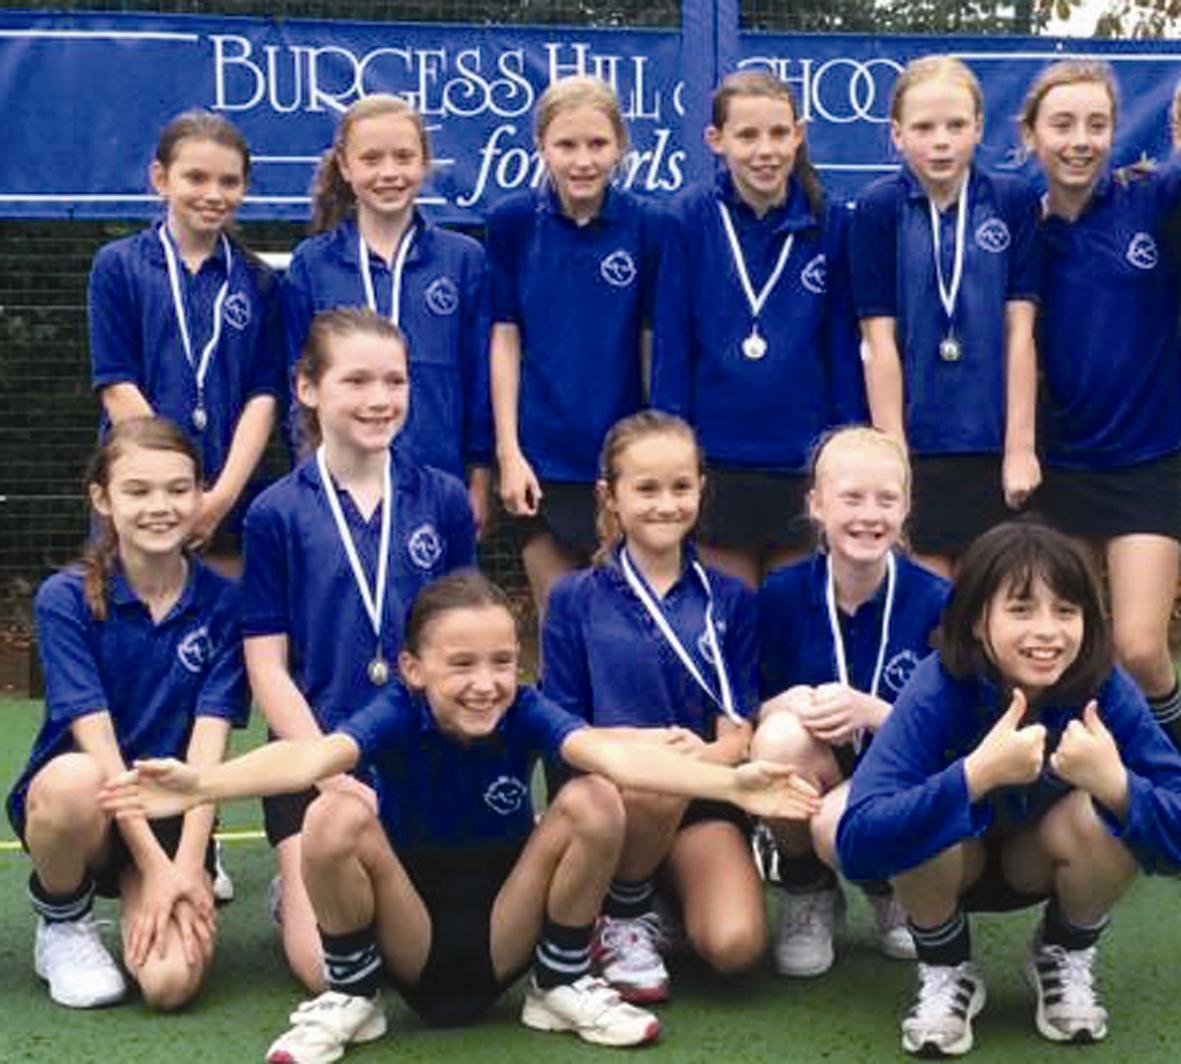 Burgess Hill School S U11 Netball Tournament Uk